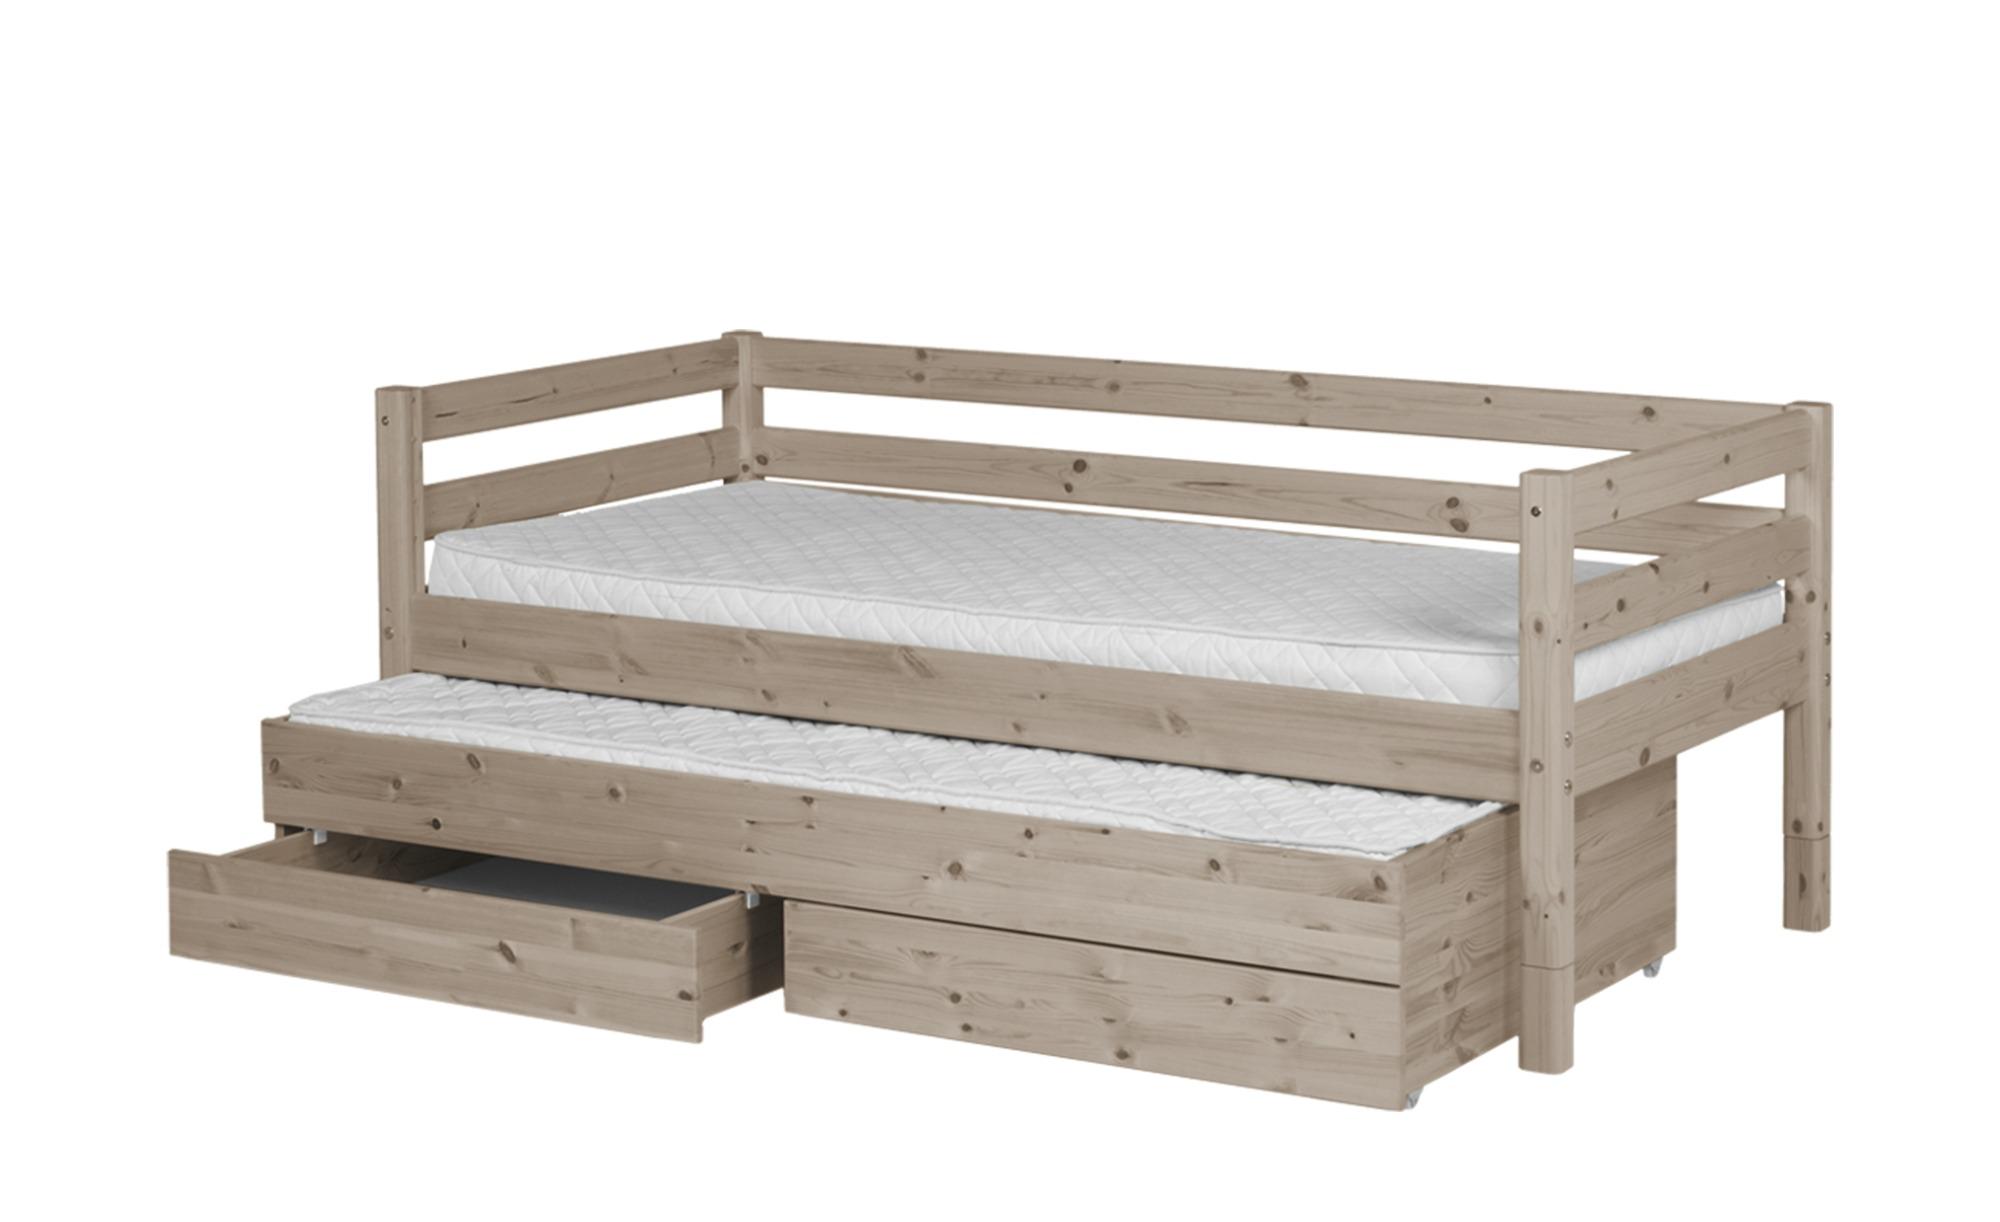 Full Size of Bett Ausklappbar Ikea Zum Doppelbett 180x200 Klappbar Ausklappbares Selber Bauen Mit Stauraum Schrank Englisch Sofa Ausklappen Wand Wandbefestigung Flexa Bett Bett Ausklappbar